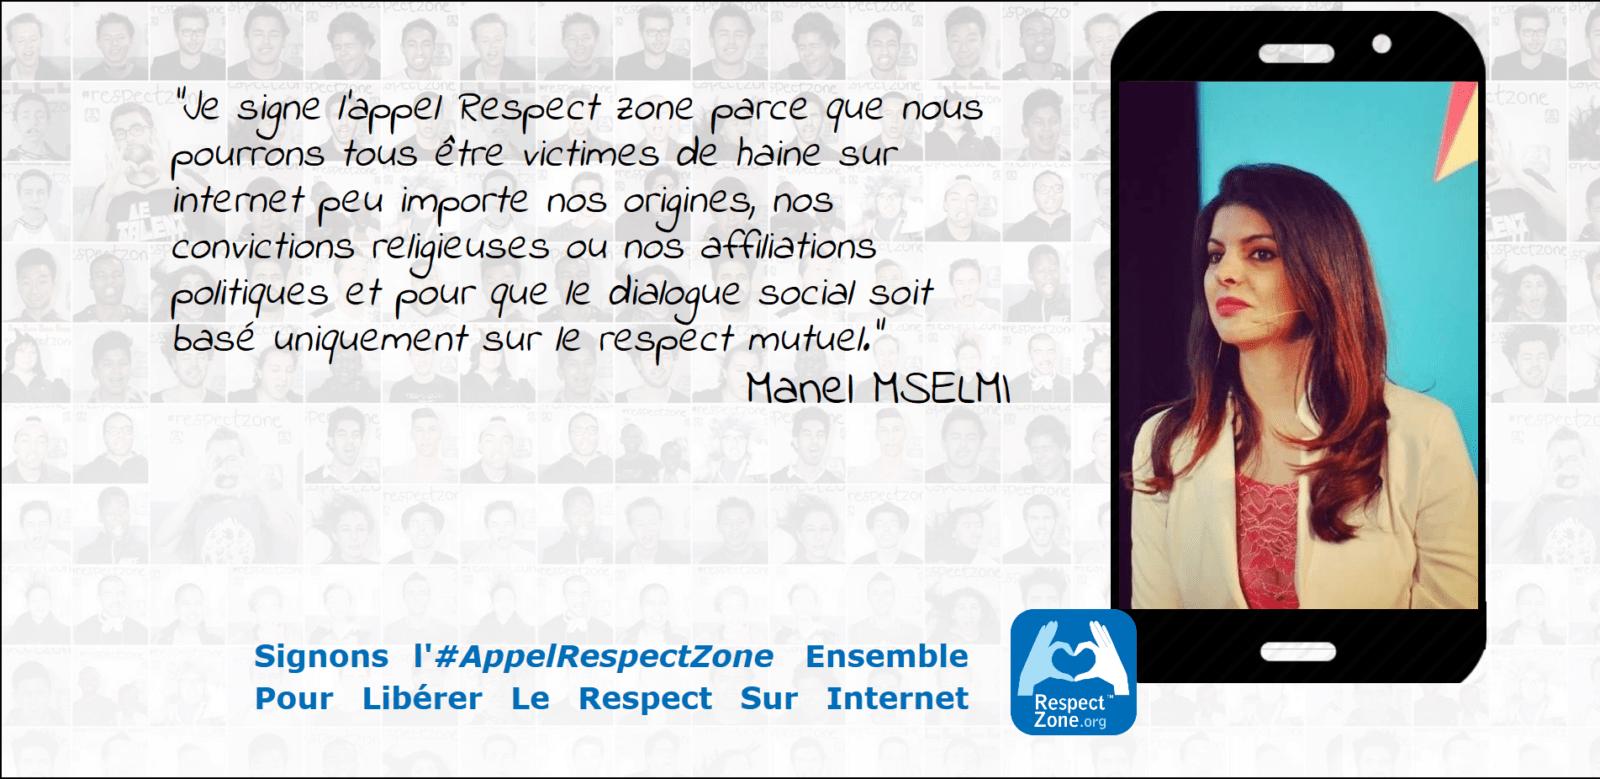 Manel MSELMI